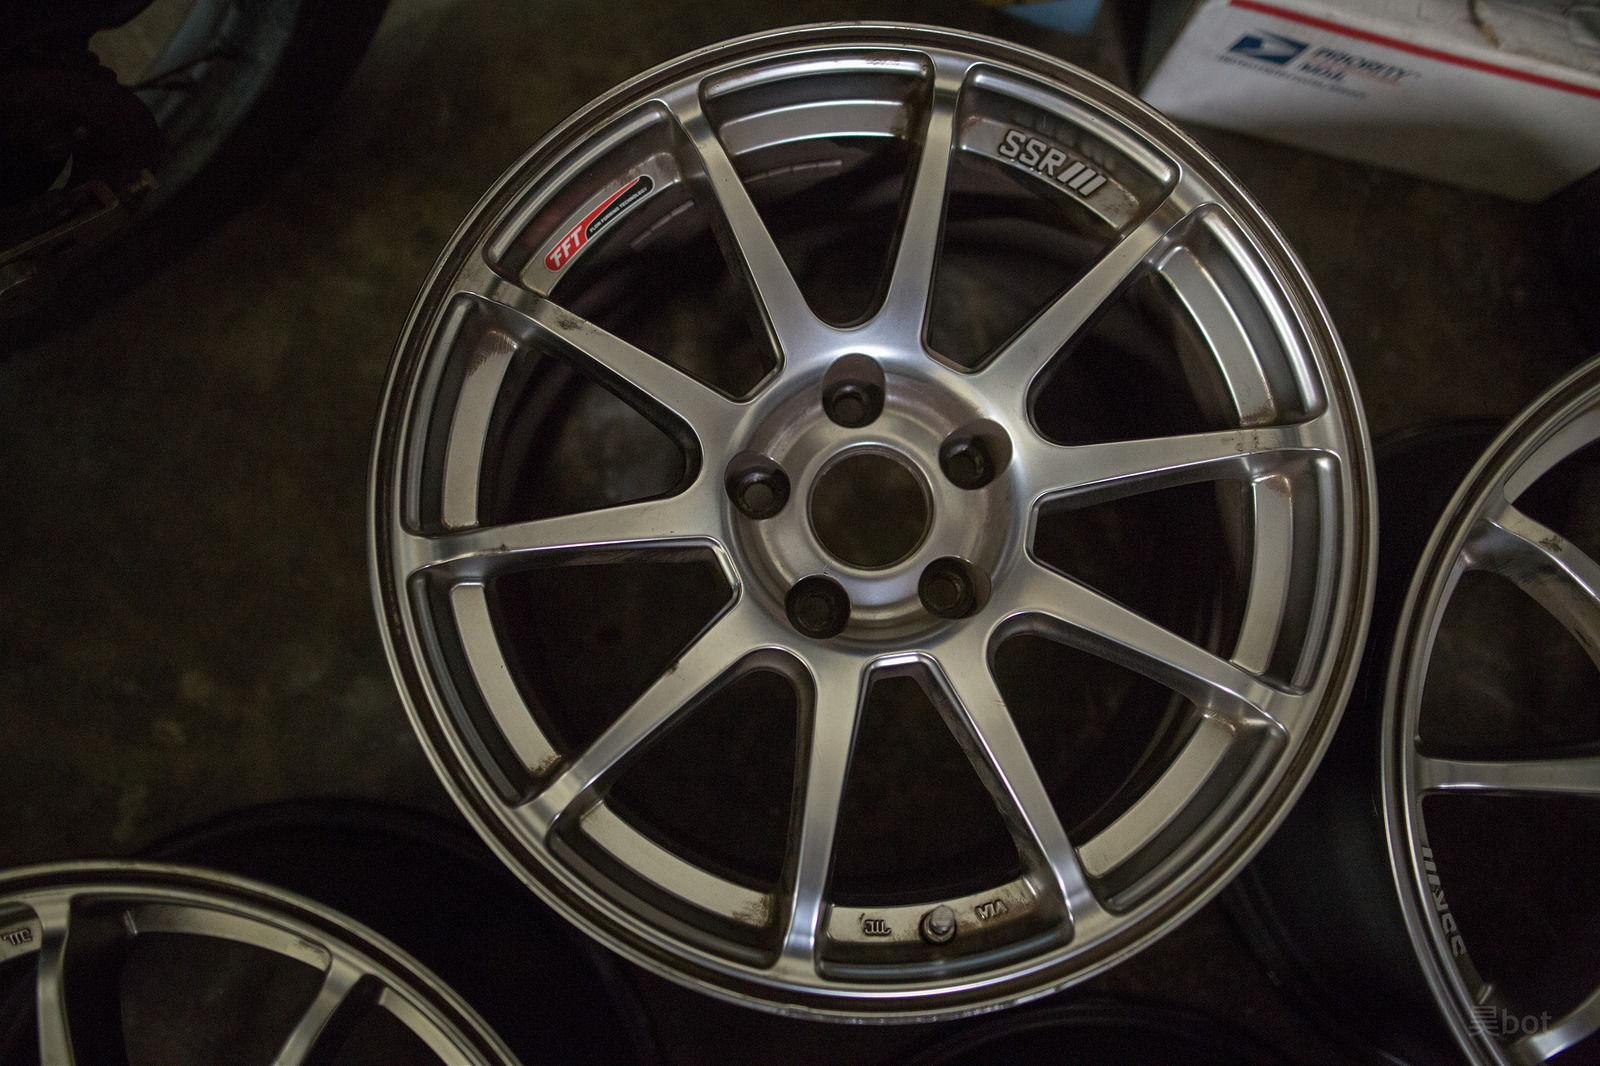 FS: SSR GTV02 silver 17x9 45mm offset 80-31569579052_2e4aa7a59f_h_a815a9b2521f95698bb93364ff7f82873c88d1a7